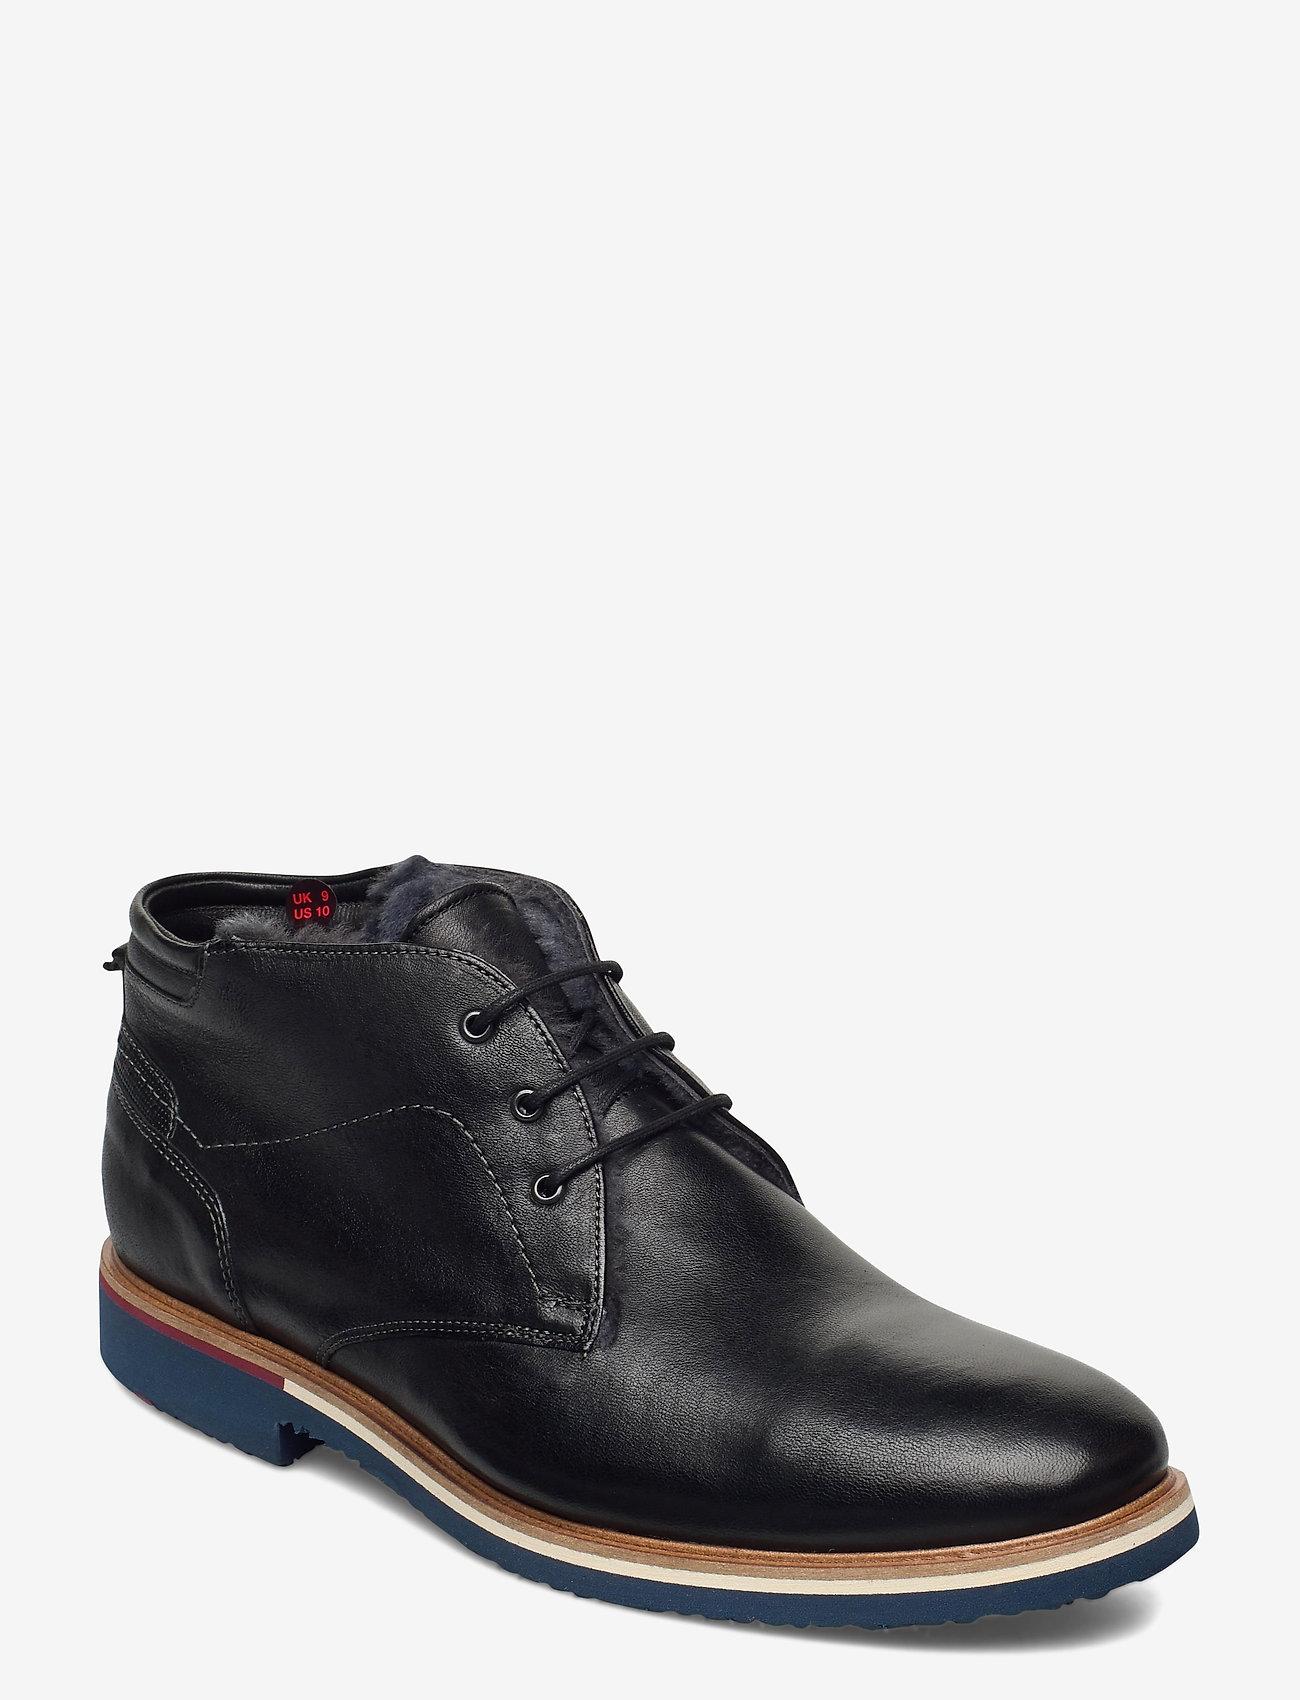 Lloyd - FARIN - desert boots - 0 - schwarz - 0